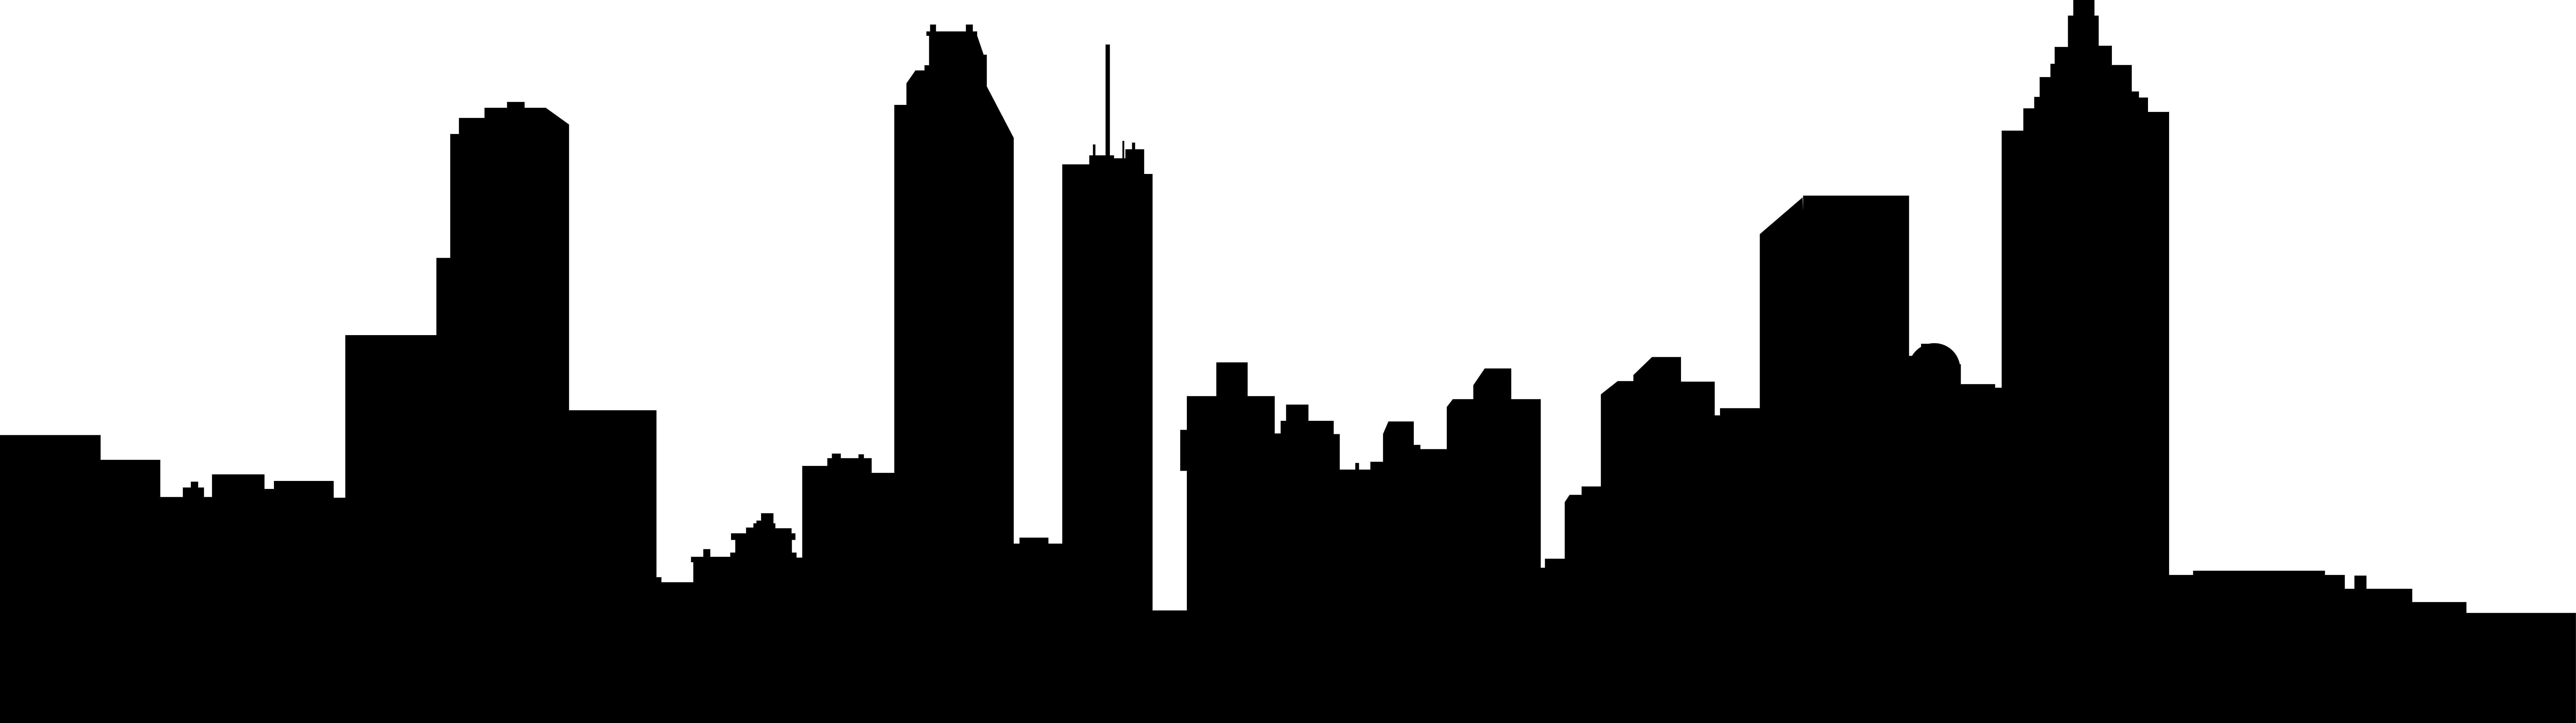 8059x2261 Atlanta Skyline Vector Image Group